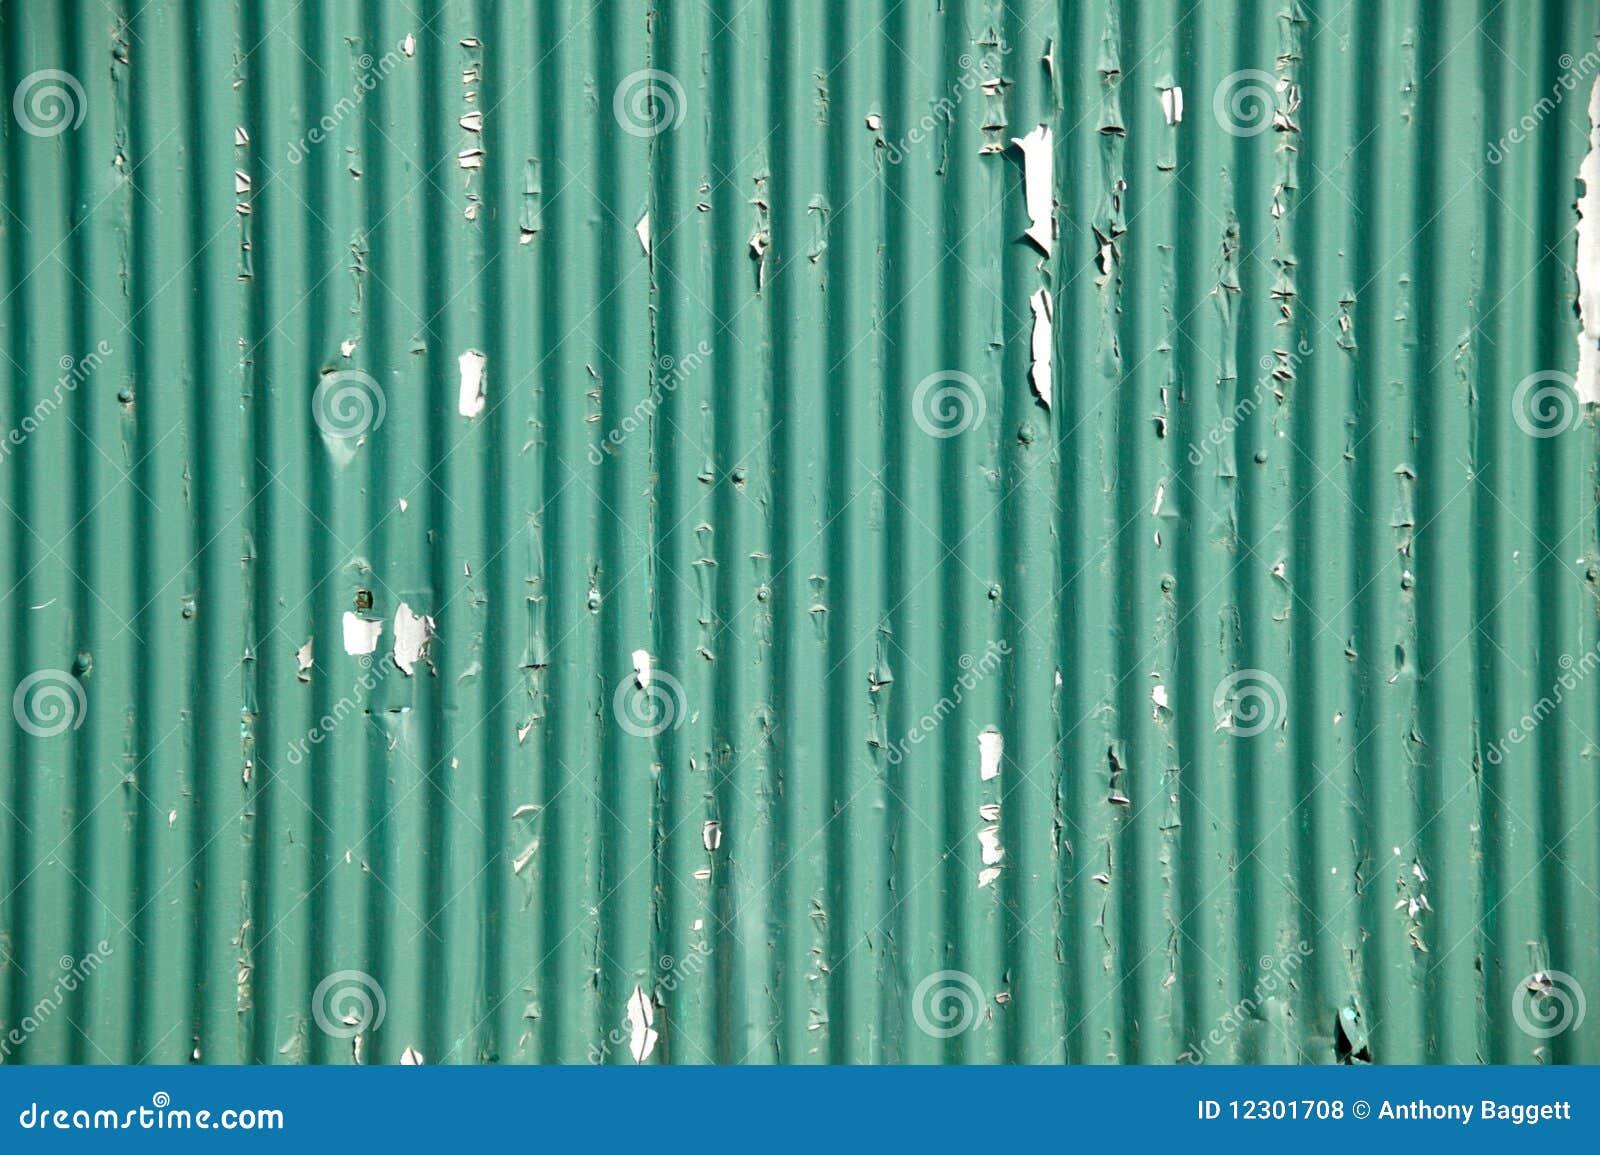 Green Corrugated Iron Fencing Stock Photo Image 12301708